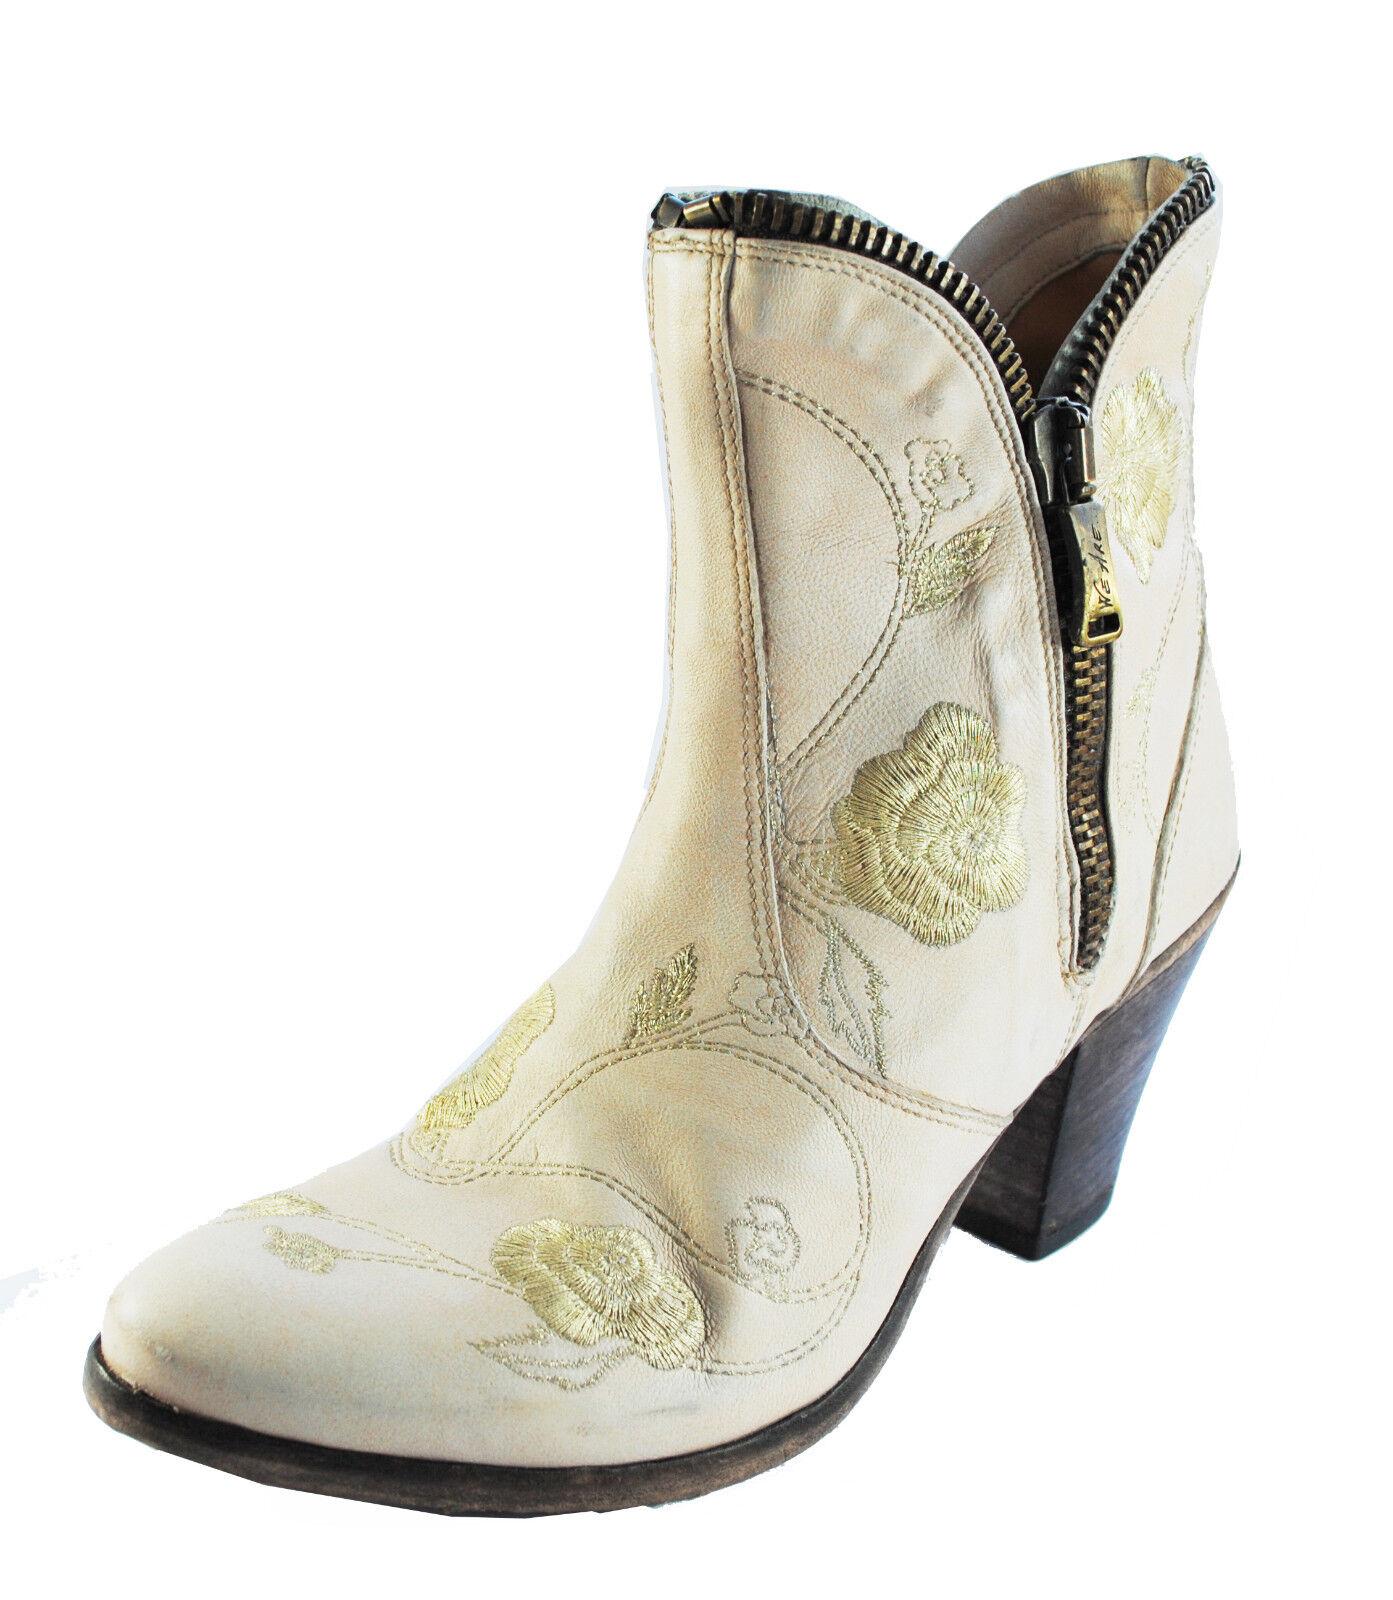 Scarpe Stivali stifletten WE ARE REPLAY ITALY HANDMADE  259 TG 41 NUOVO | Elegante Nello Stile  | Sig/Sig Ra Scarpa